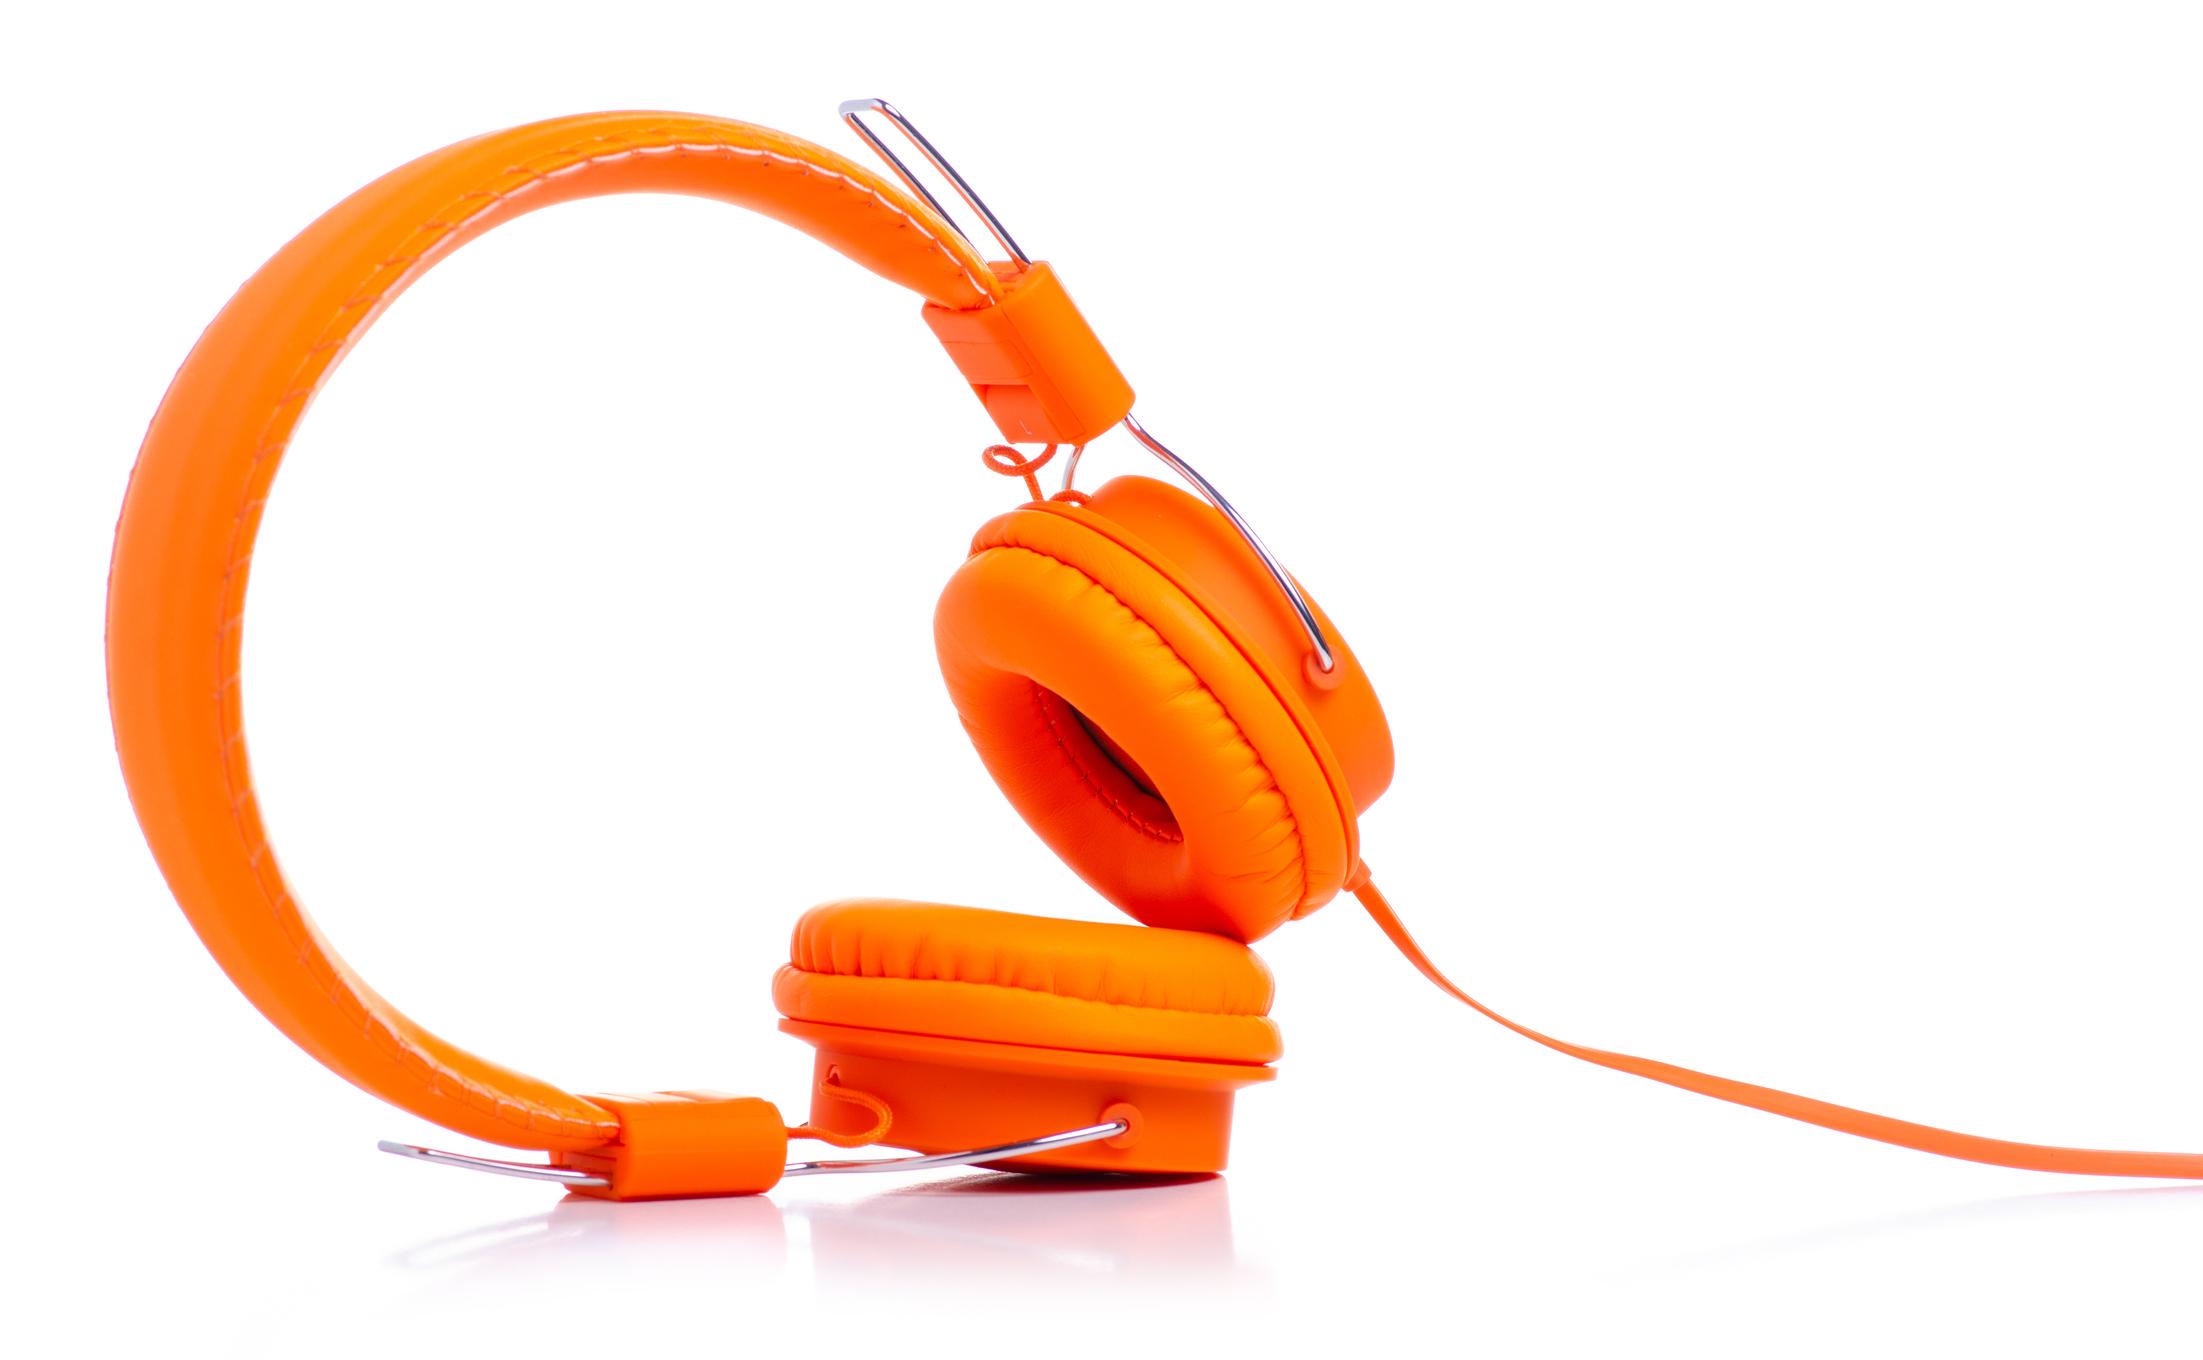 Compelling content with orange headphones - radio